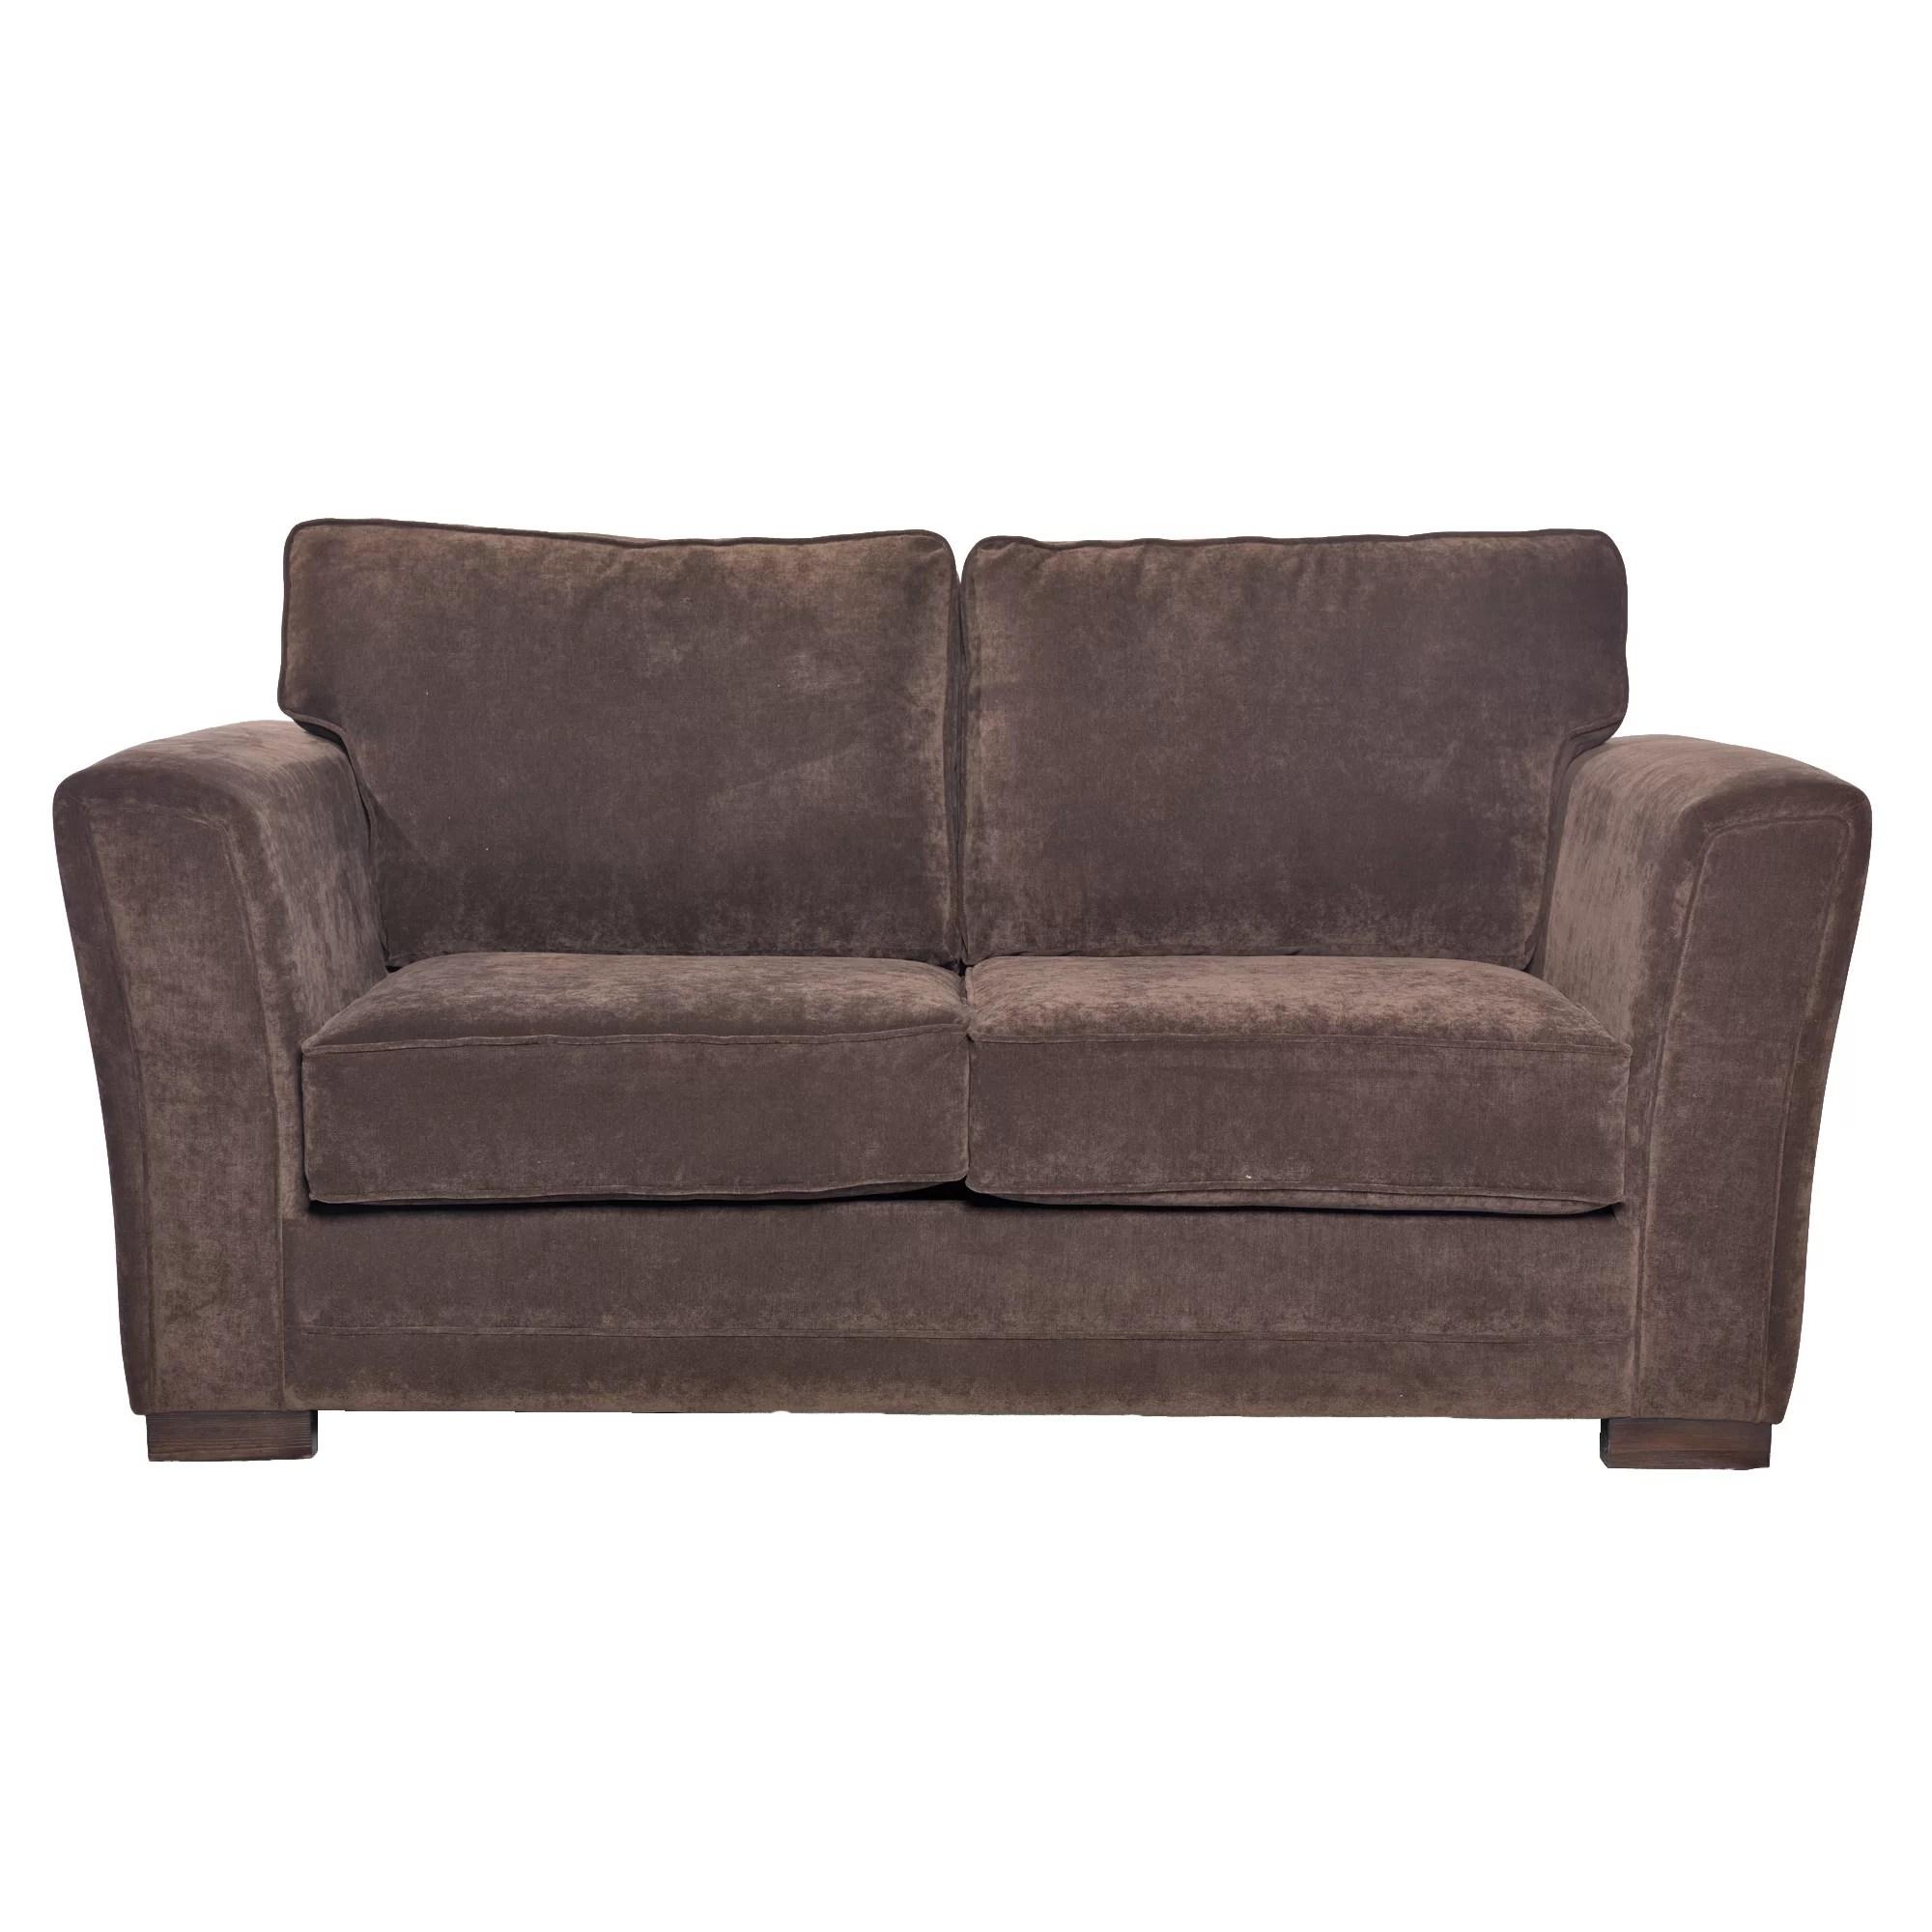 3 seater sofa throws uk modern leather living room icon design venice wayfair